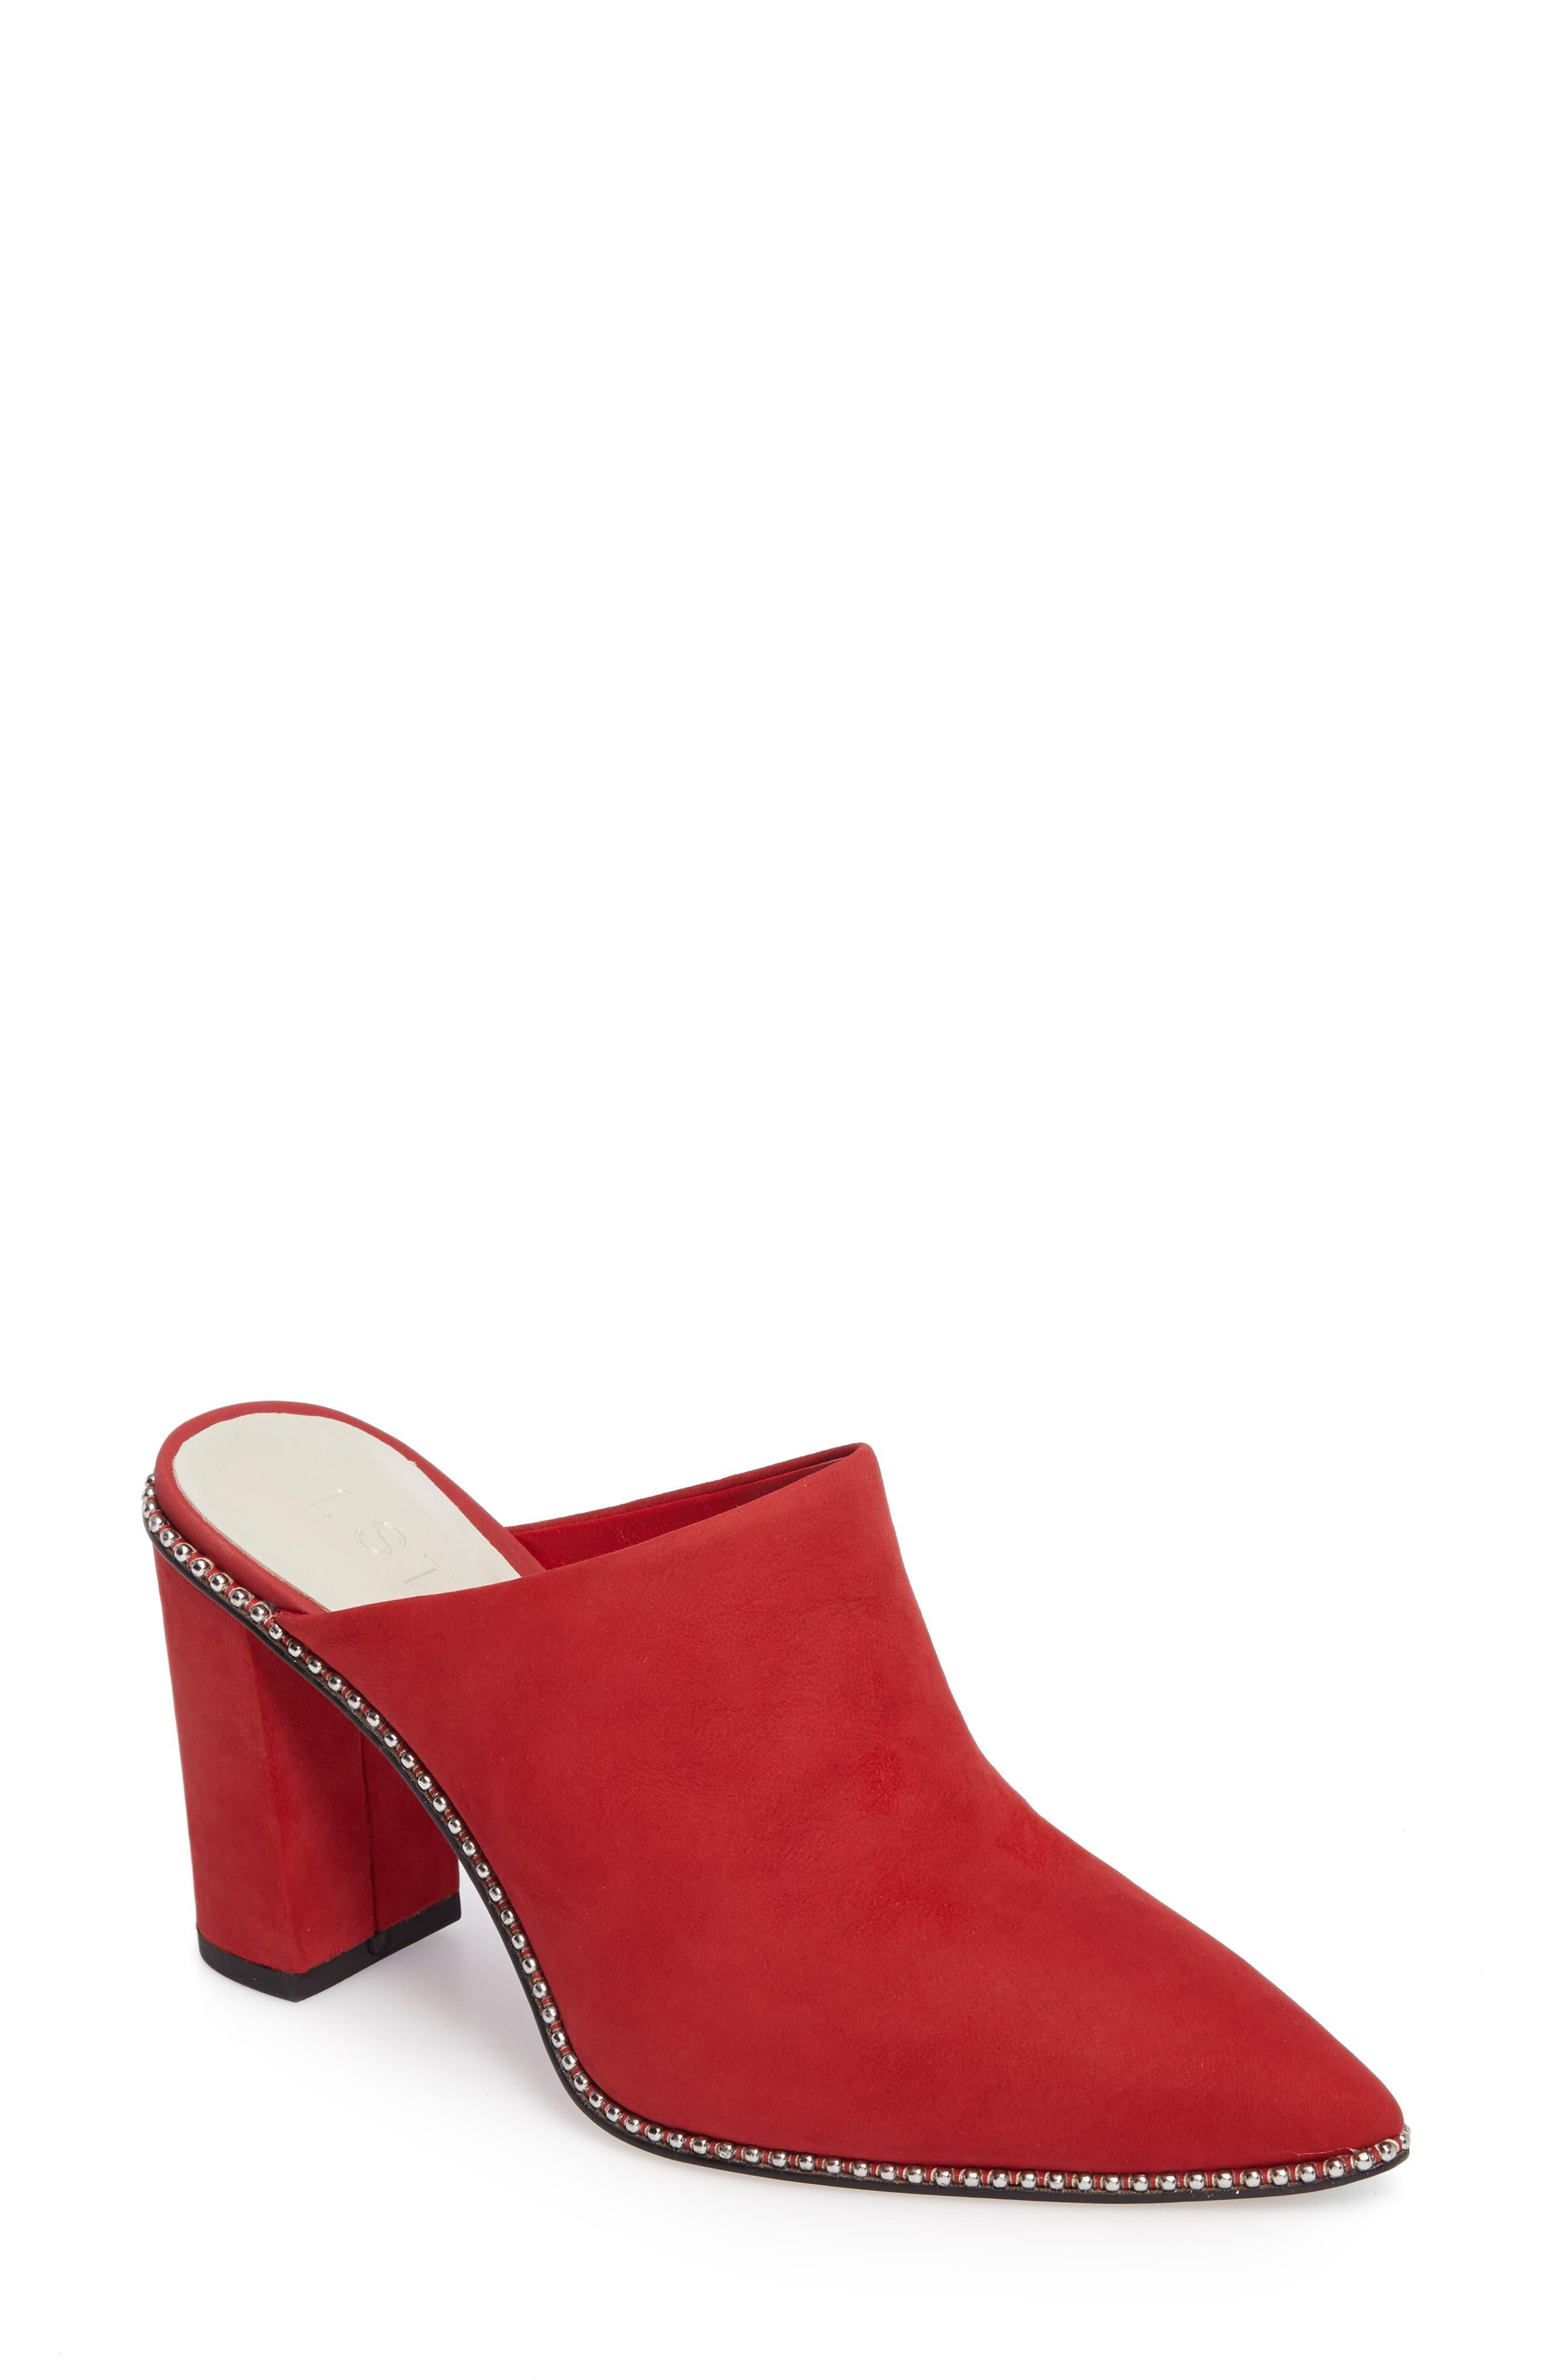 Relle Mule,                             Main thumbnail 1, color,                             Scarlet Leather